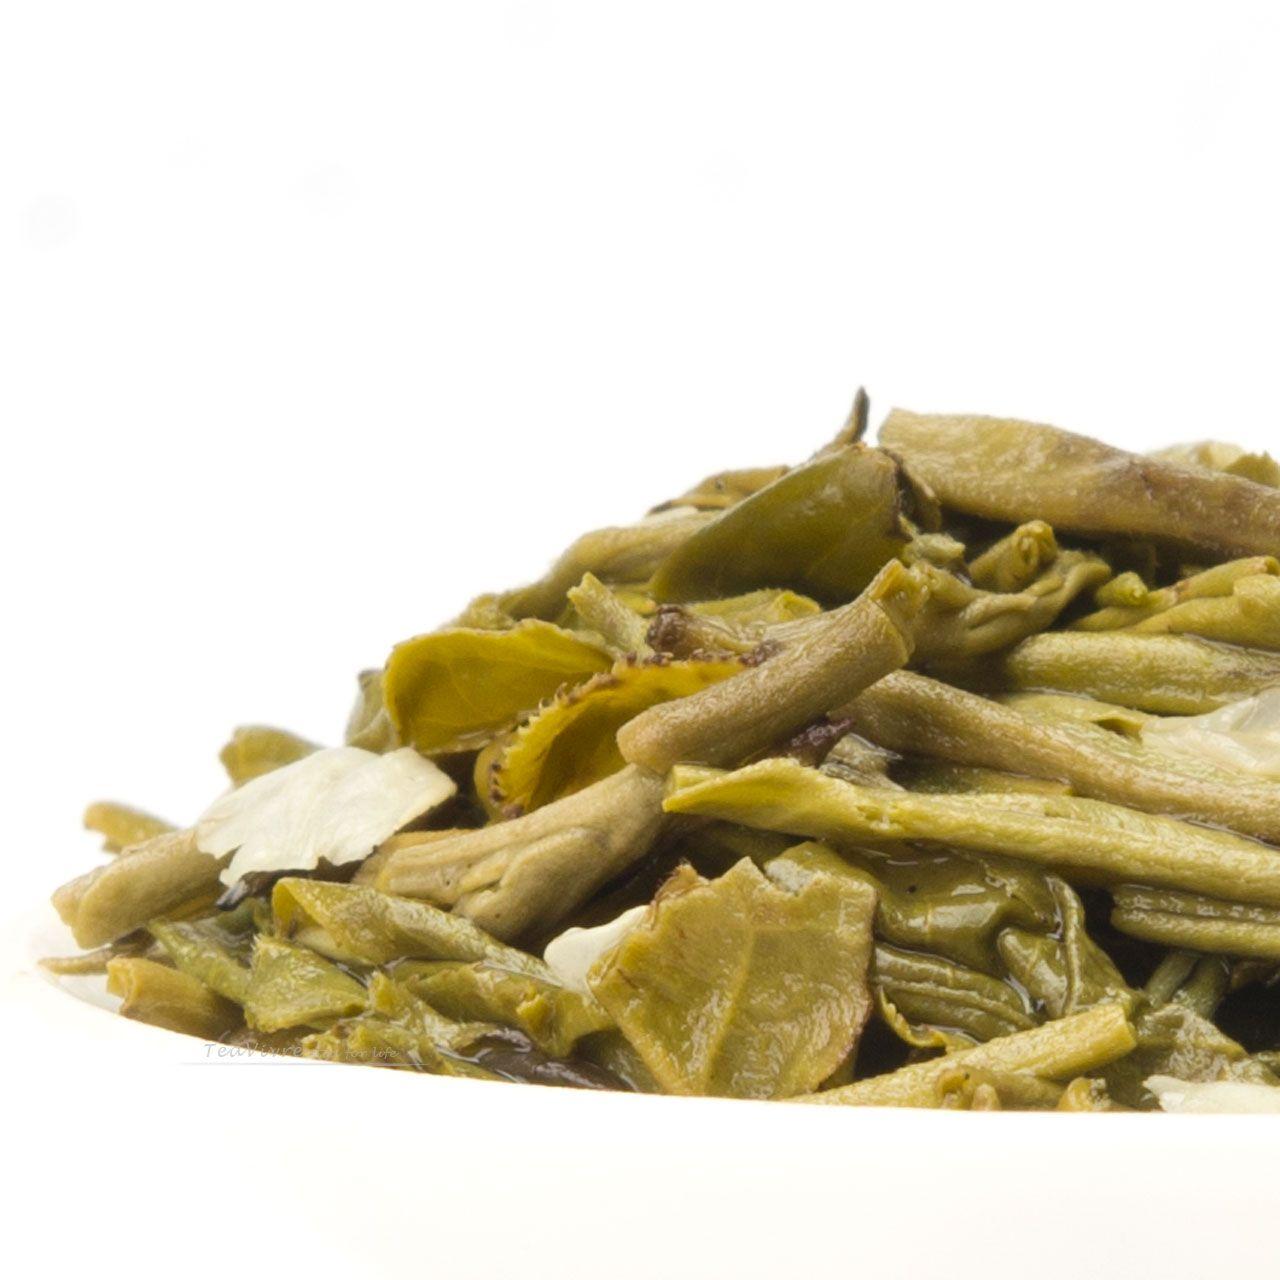 Mo Li Piao Xue Jasmine Green Tea Jasmine green tea